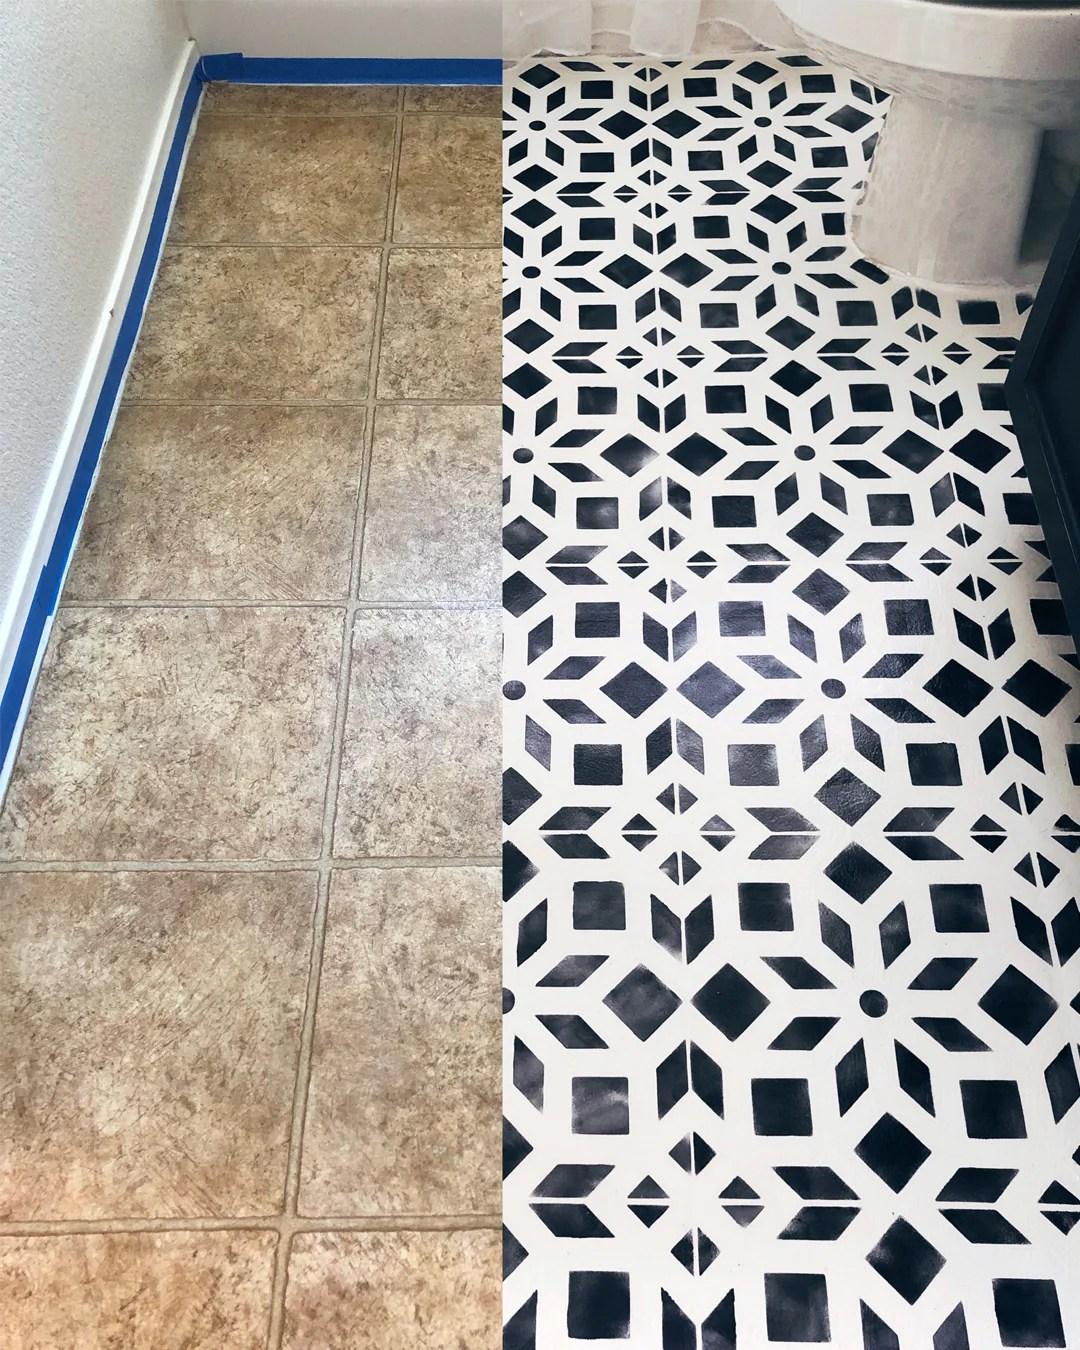 how to paint linoleum or tile floors